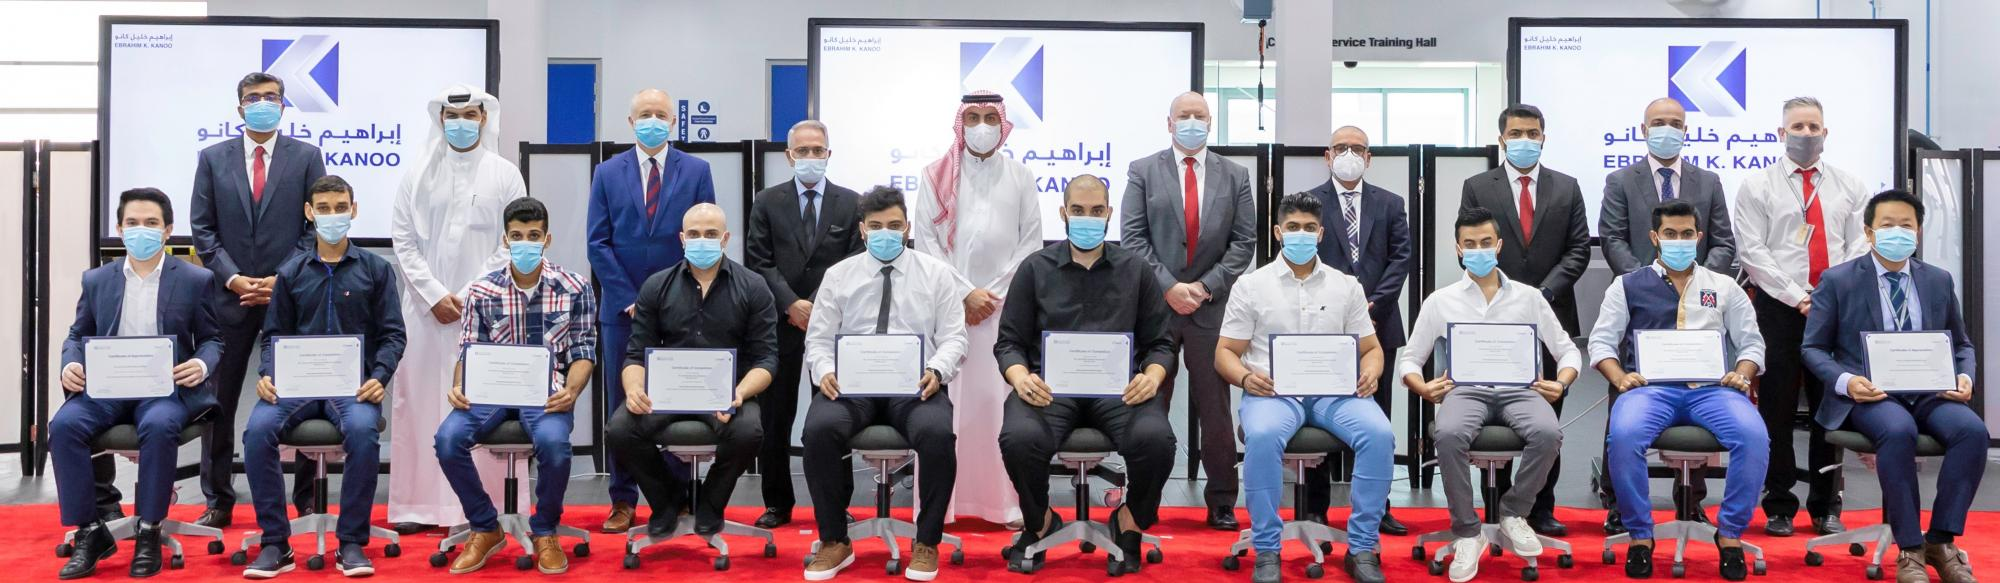 Ebrahim K. Kanoo Honours Bahraini Technicians